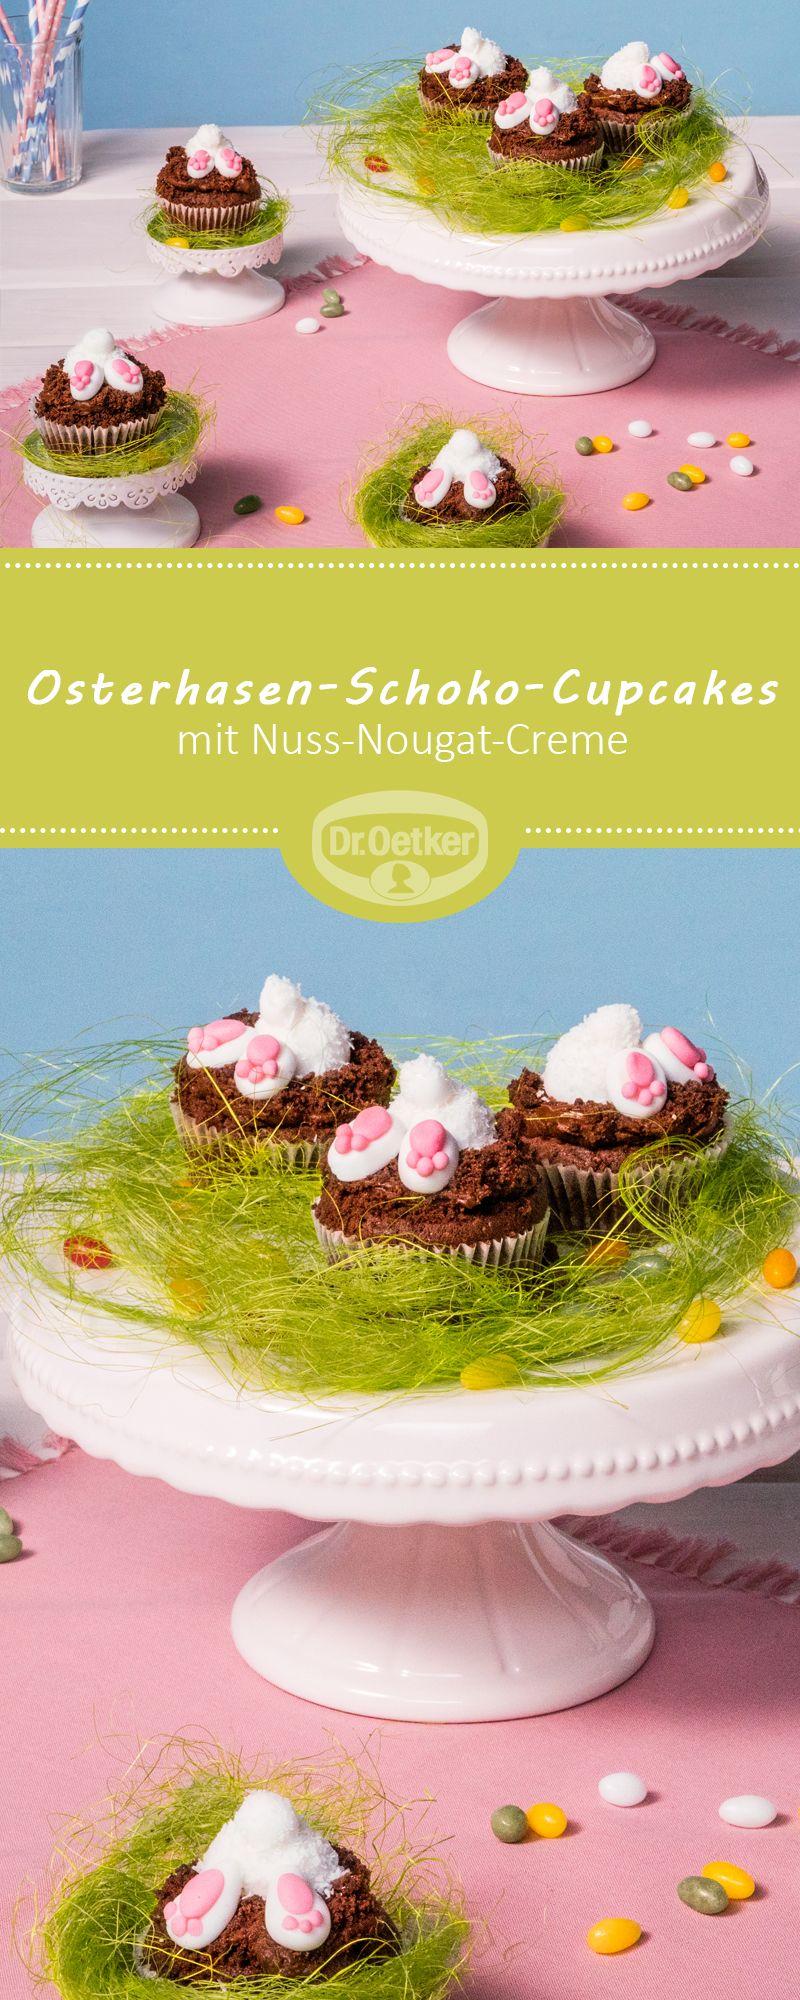 Osterhasen-Schoko-Cupcakes #chocolatepops